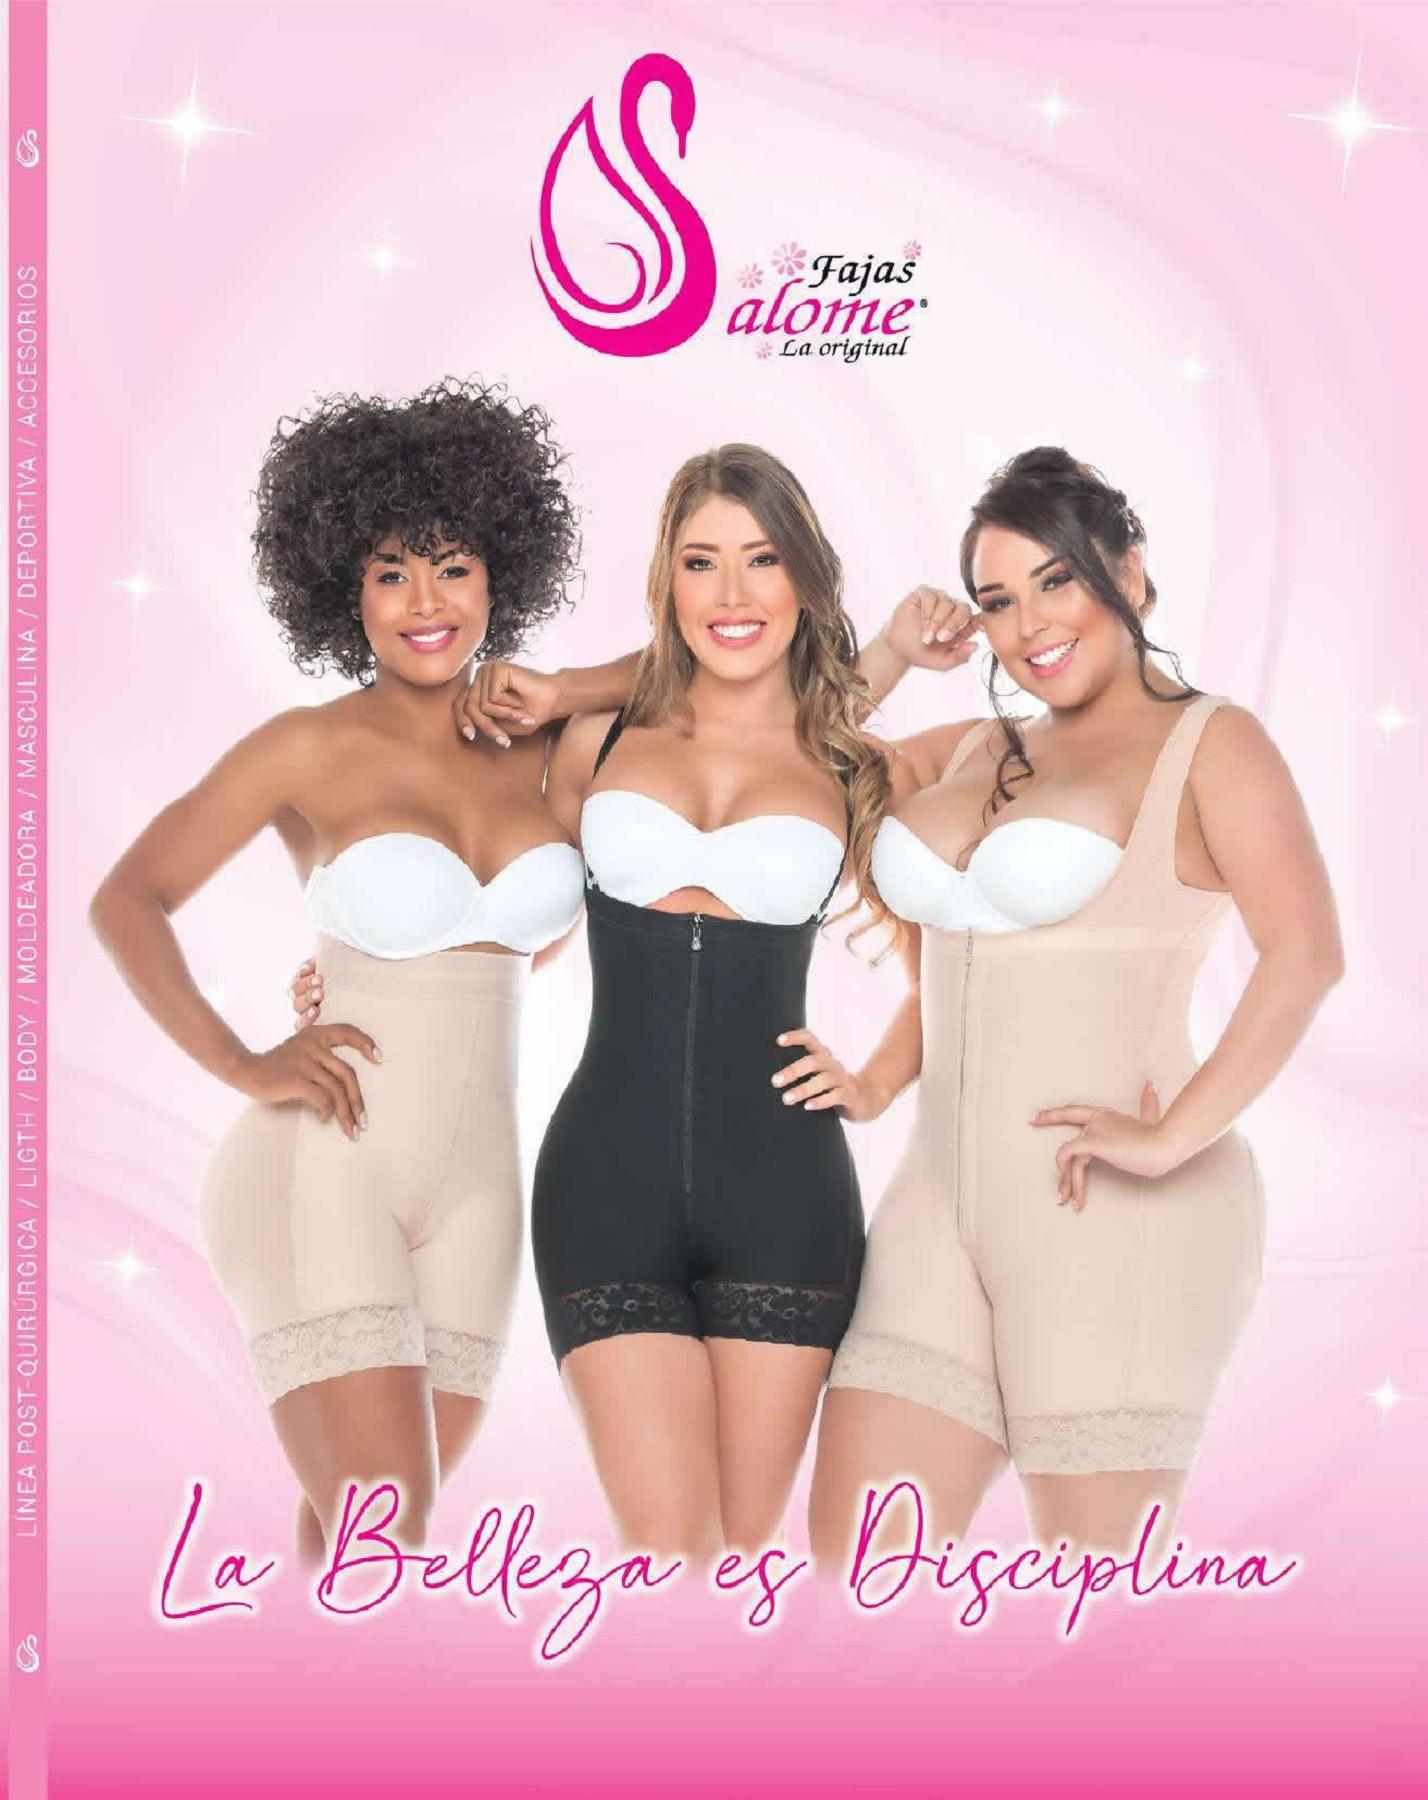 Fajas Salome